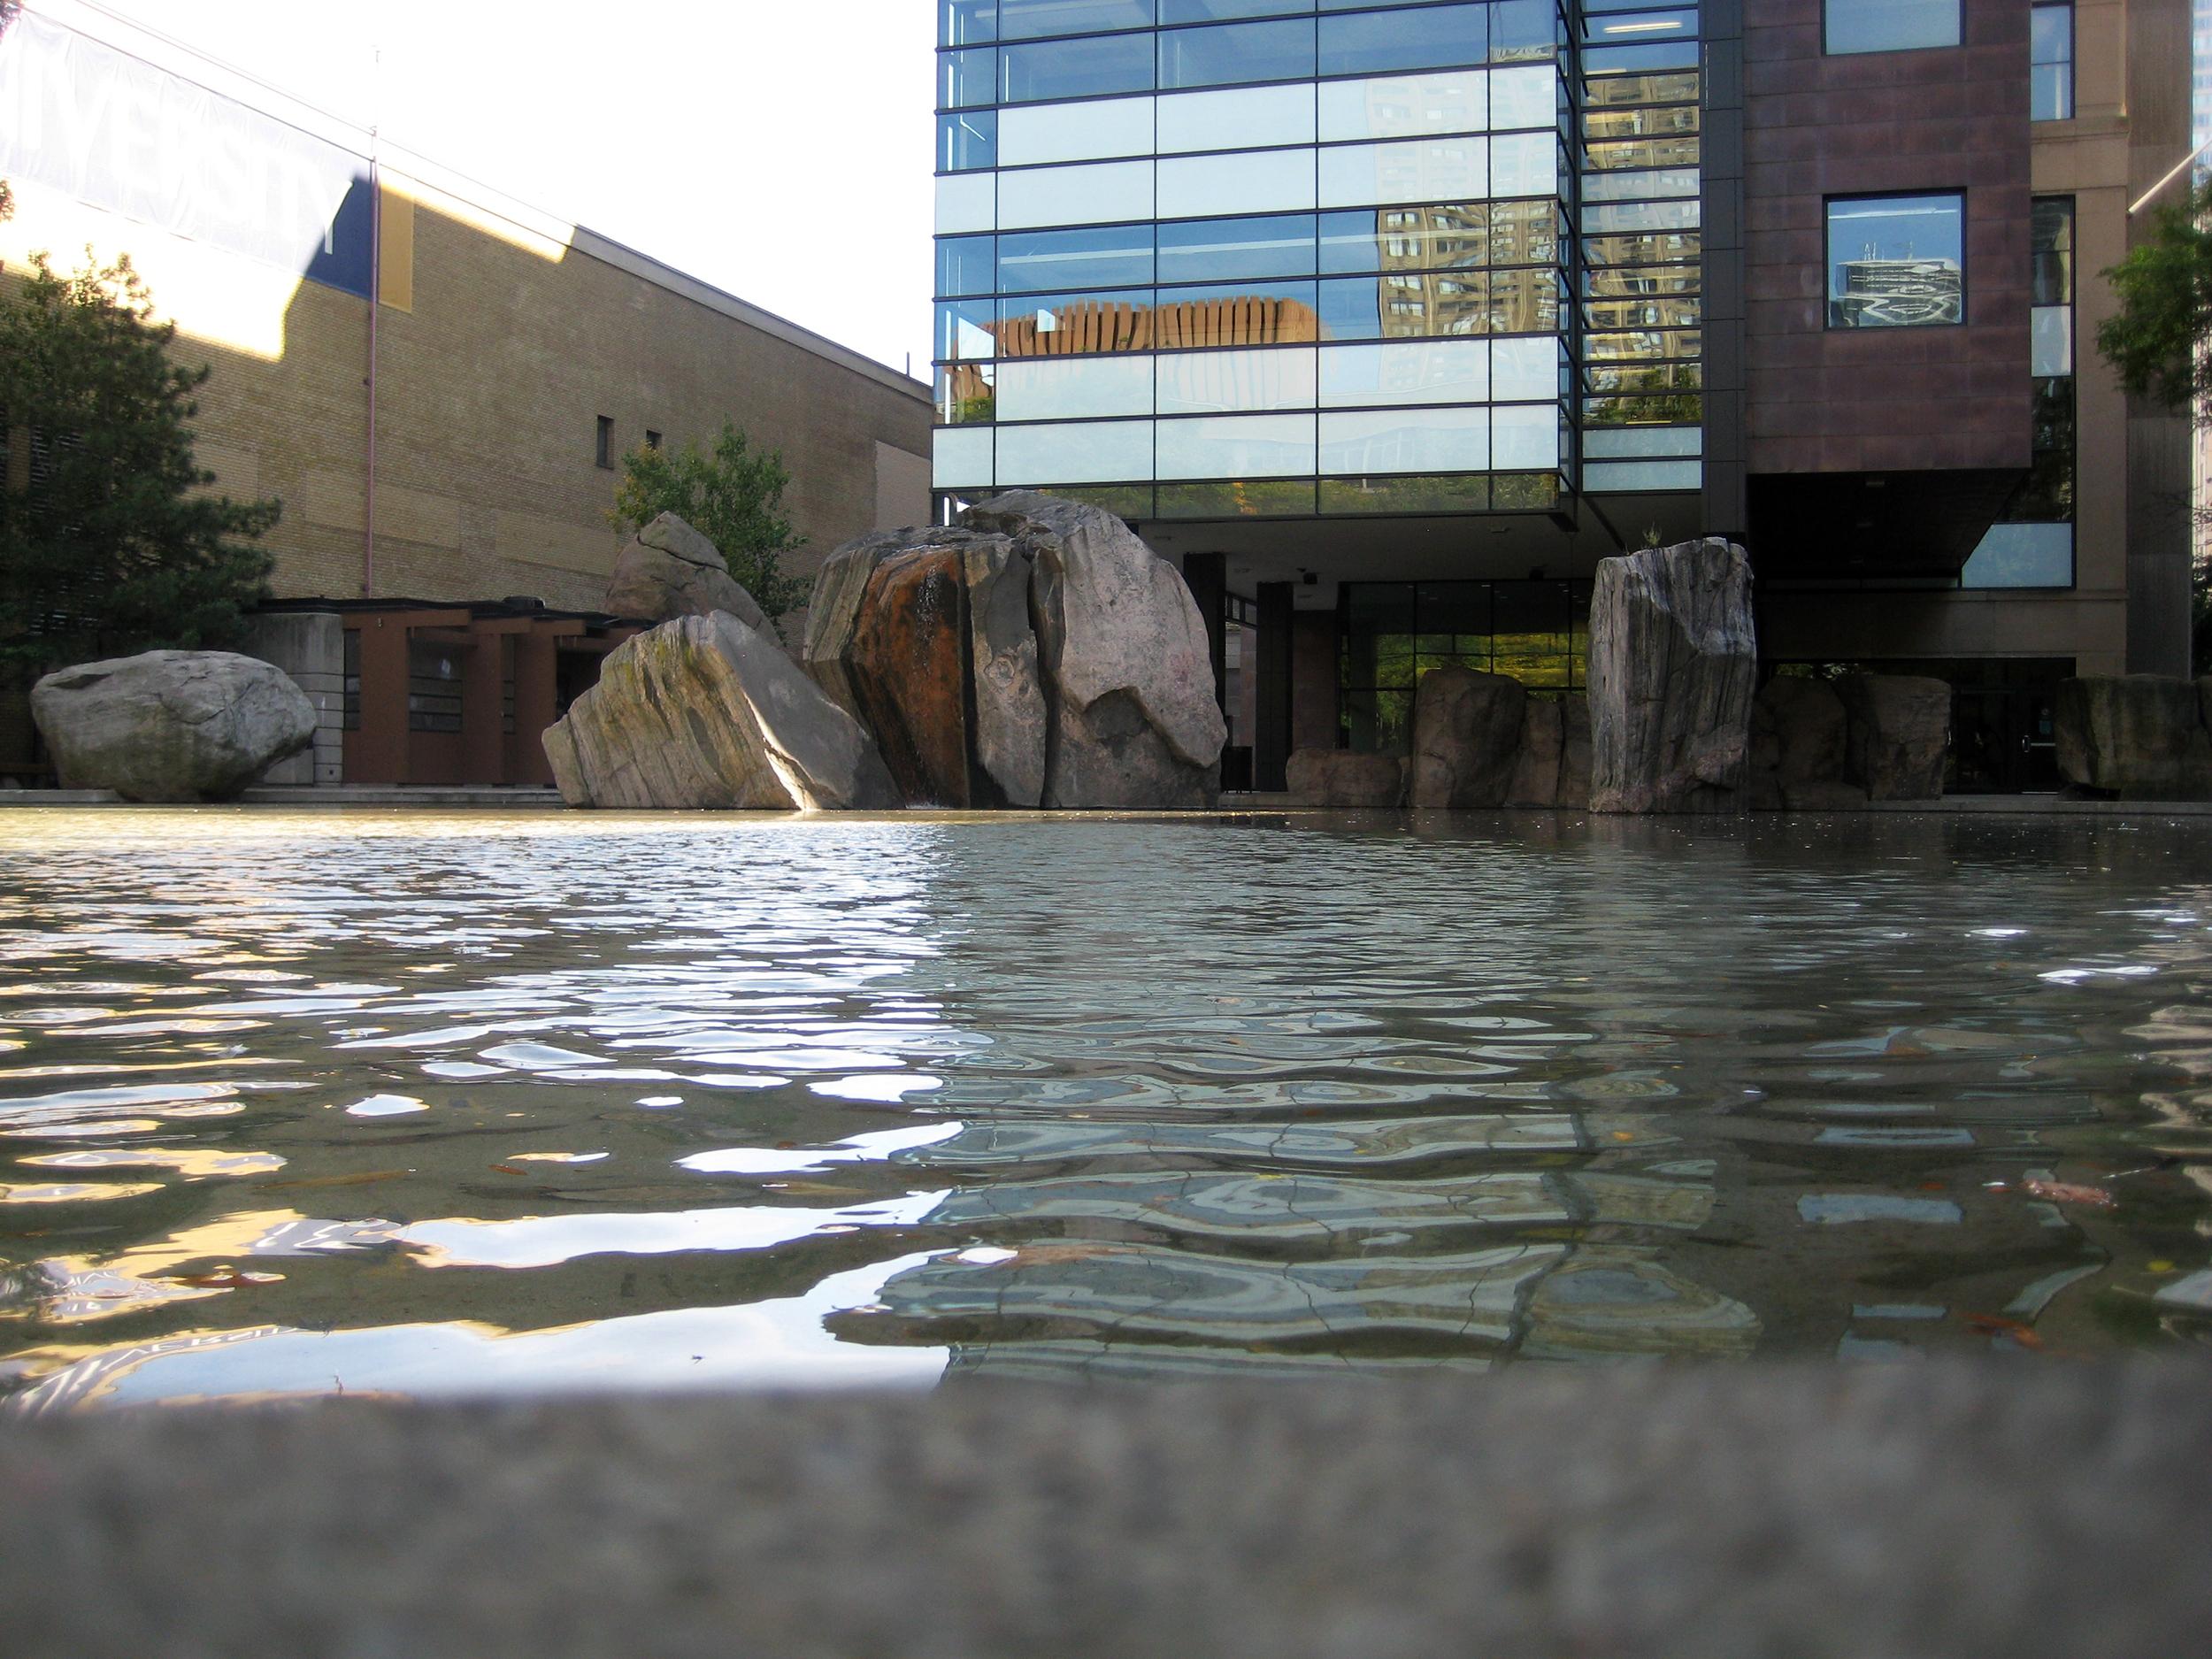 Lake Devo at Ryerson University in Toronto pictured on Aug. 21, 2008. (Steve Silva)